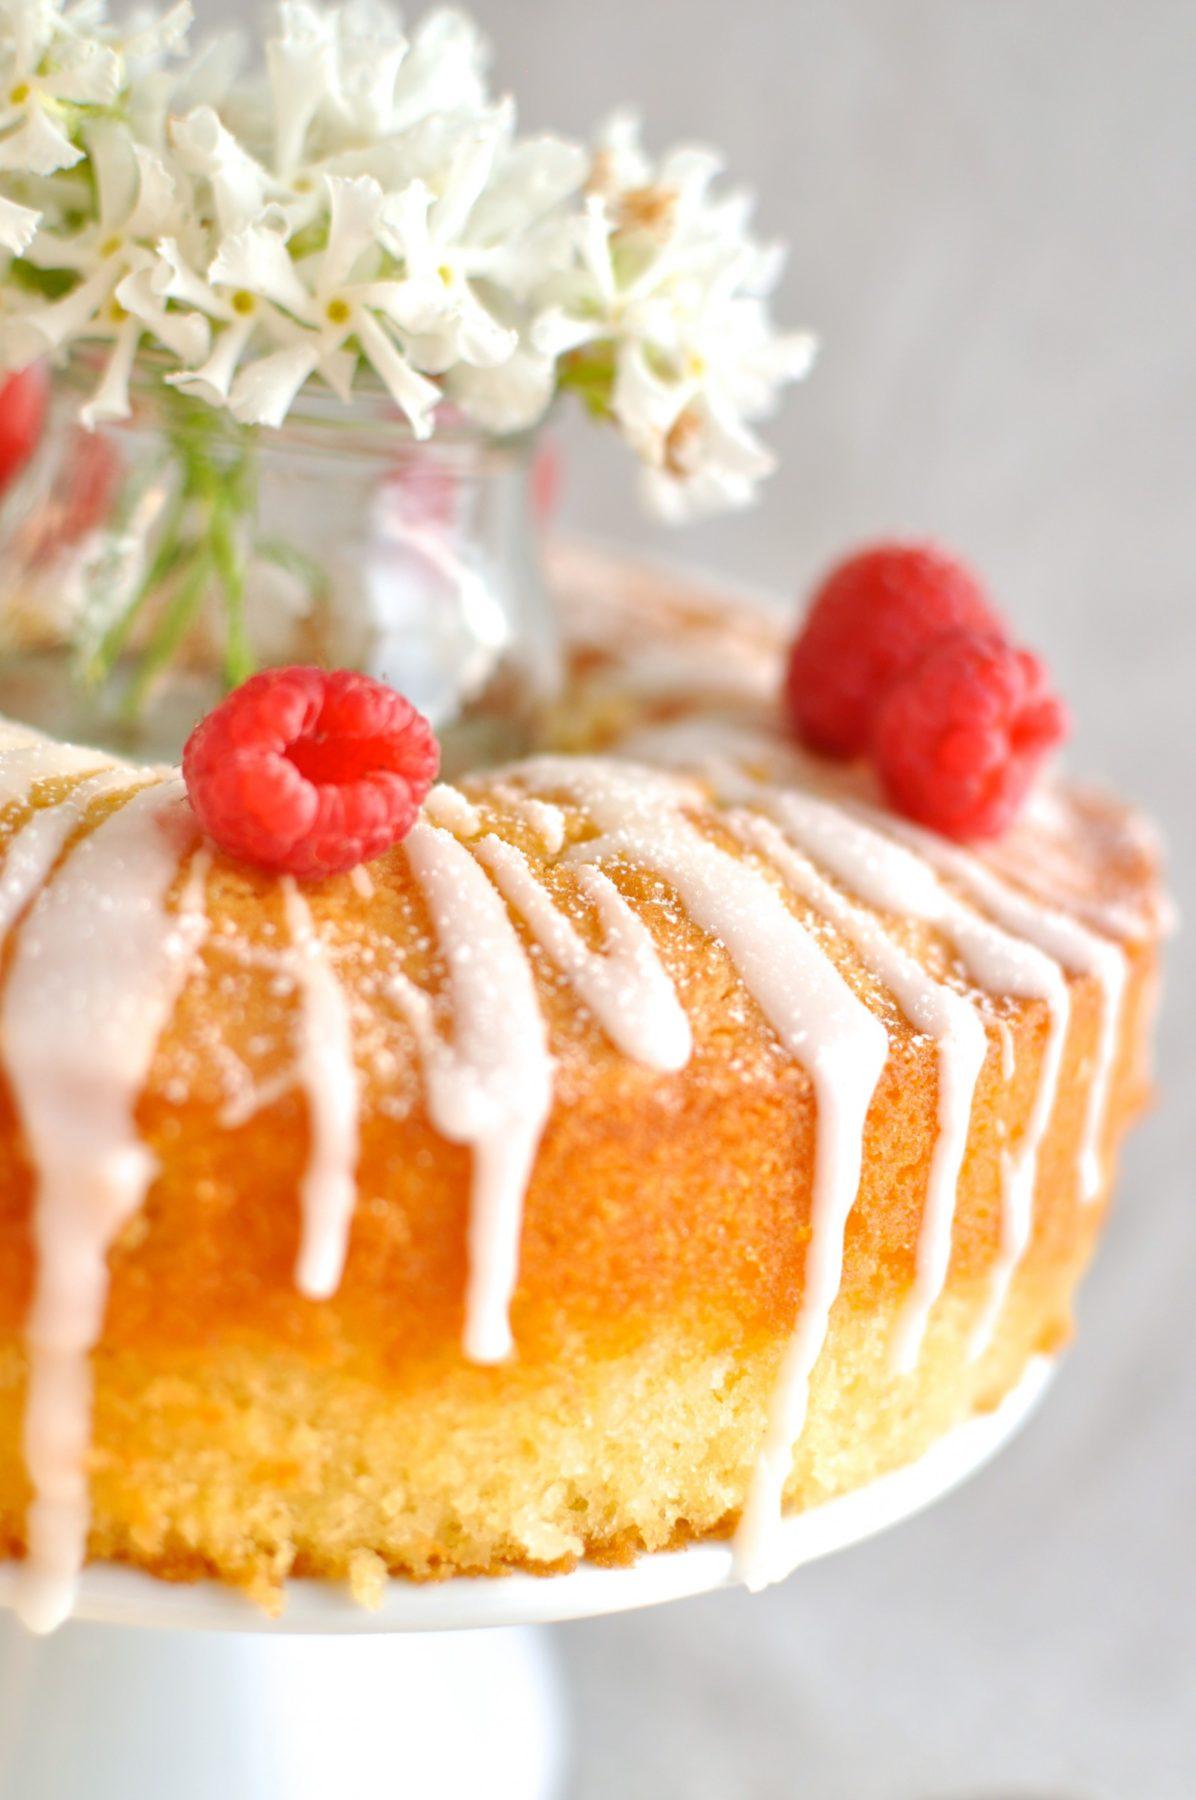 Vanilla almond cake with lemon drizzle